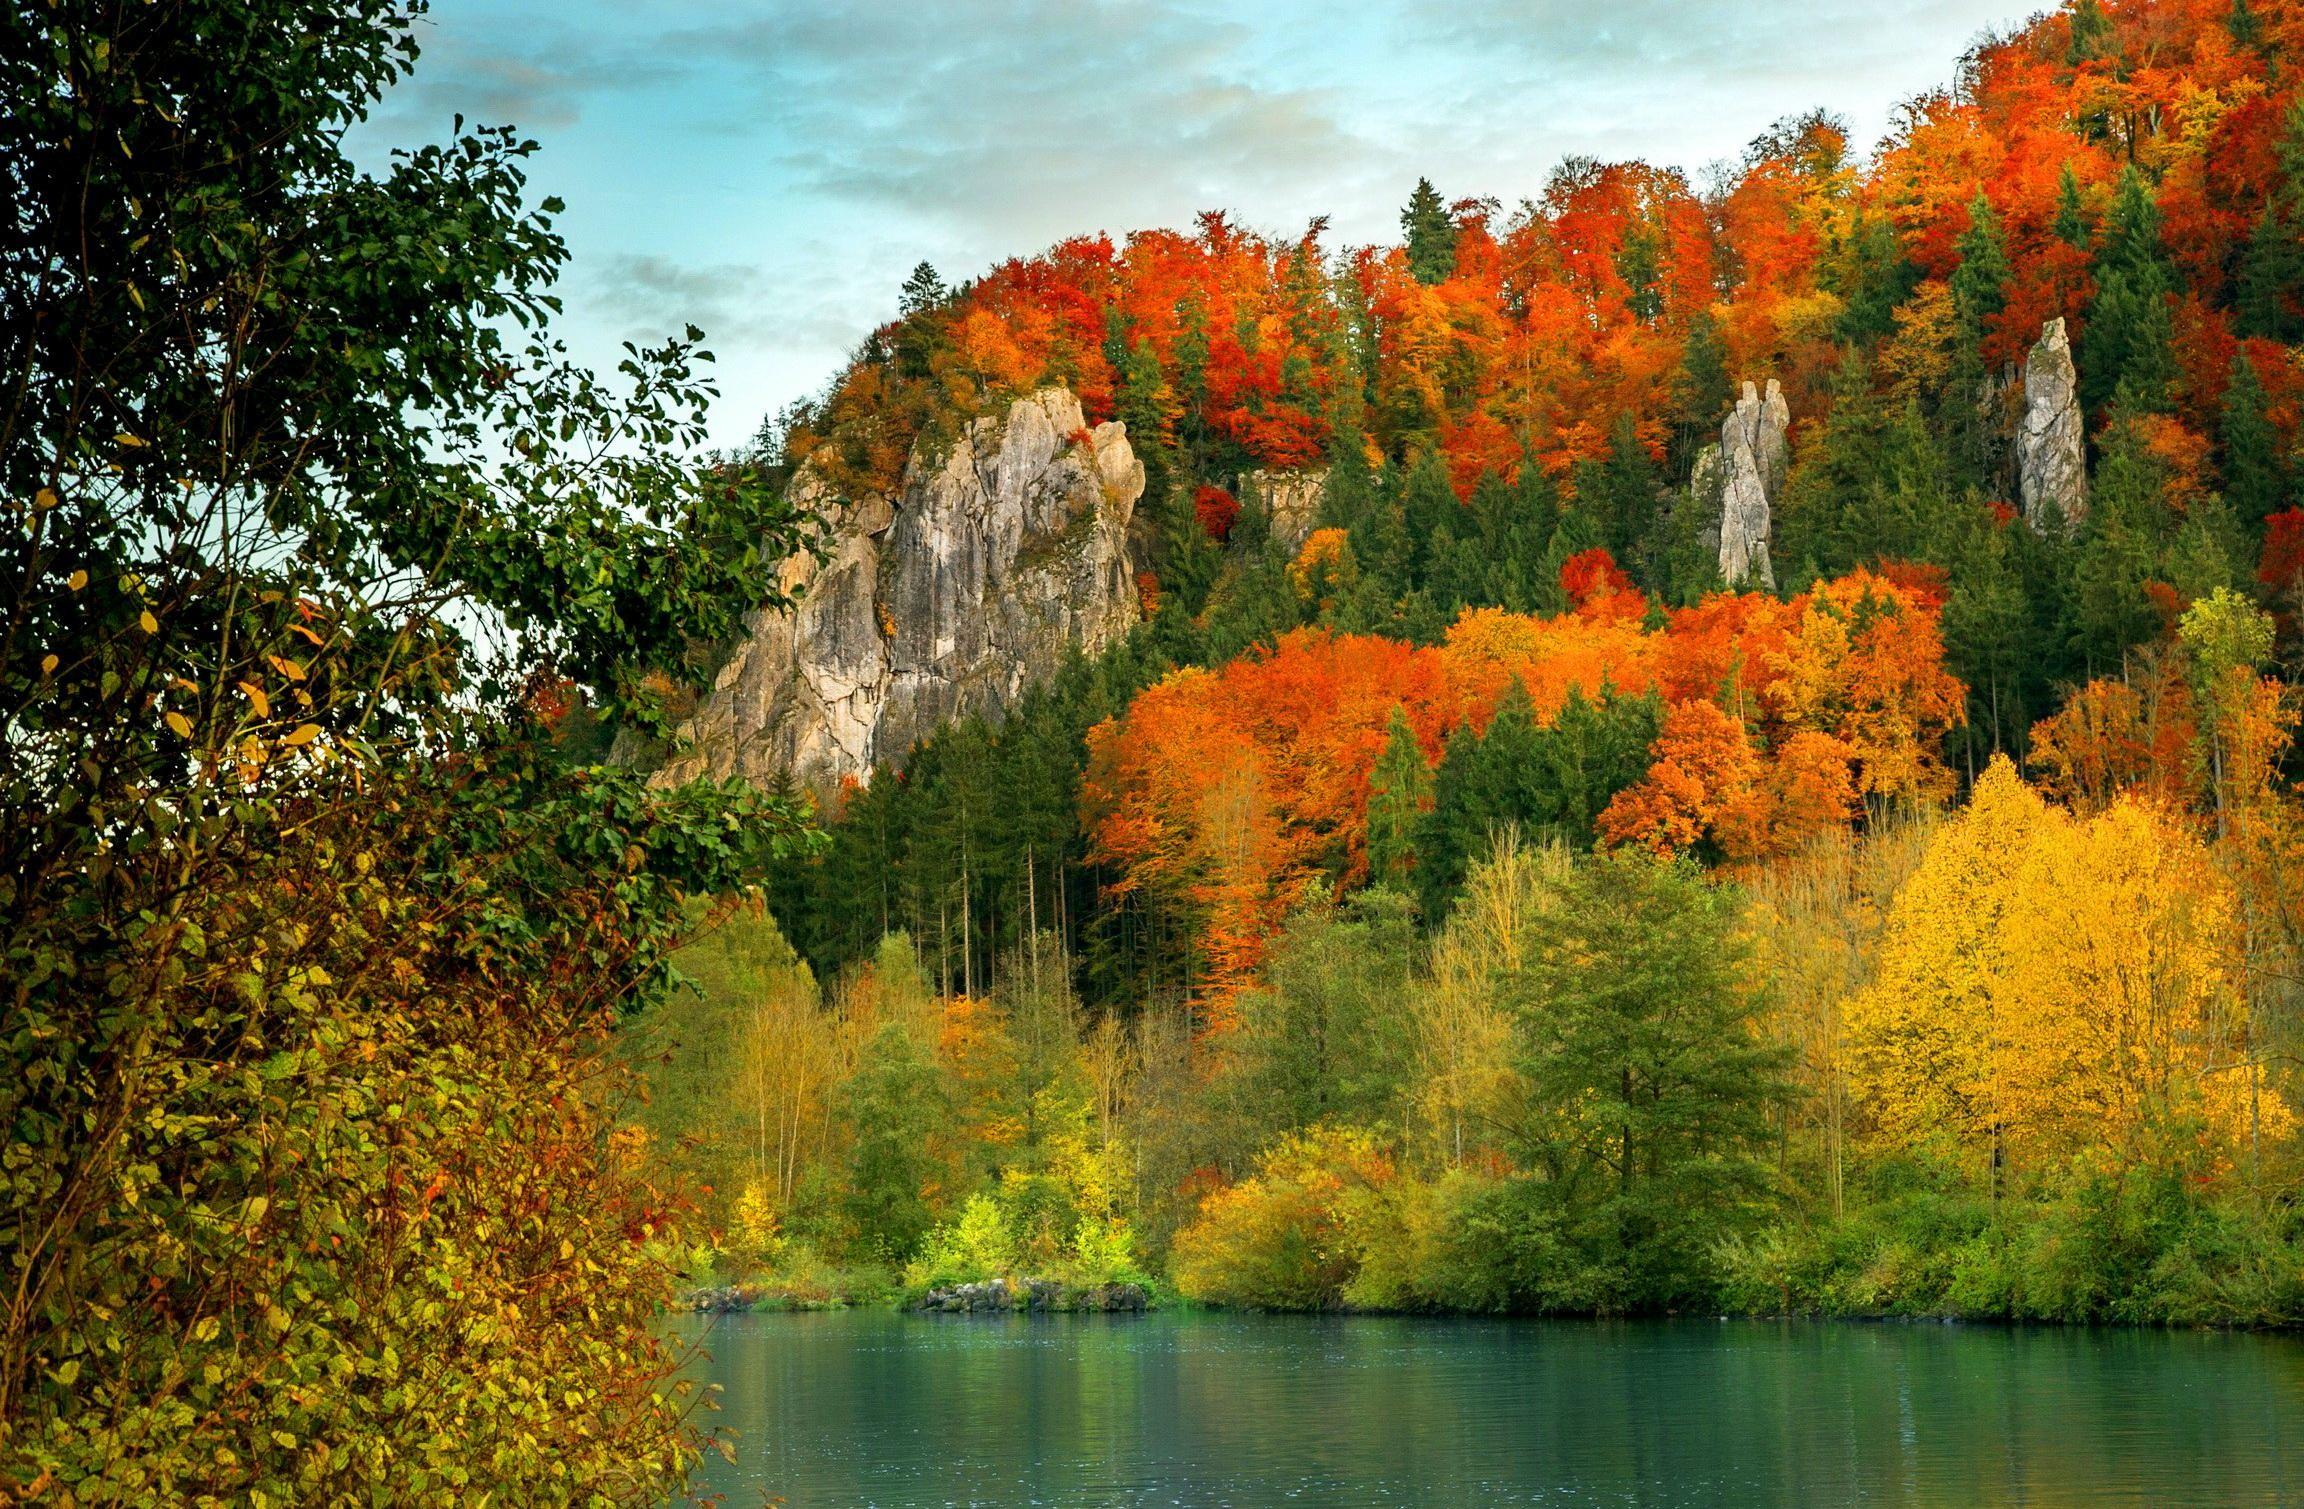 autumn mountains backgrounds. Modren Autumn 2304x1509 Autumn In Mountains Wallpaper 28 Wallpapers To Backgrounds